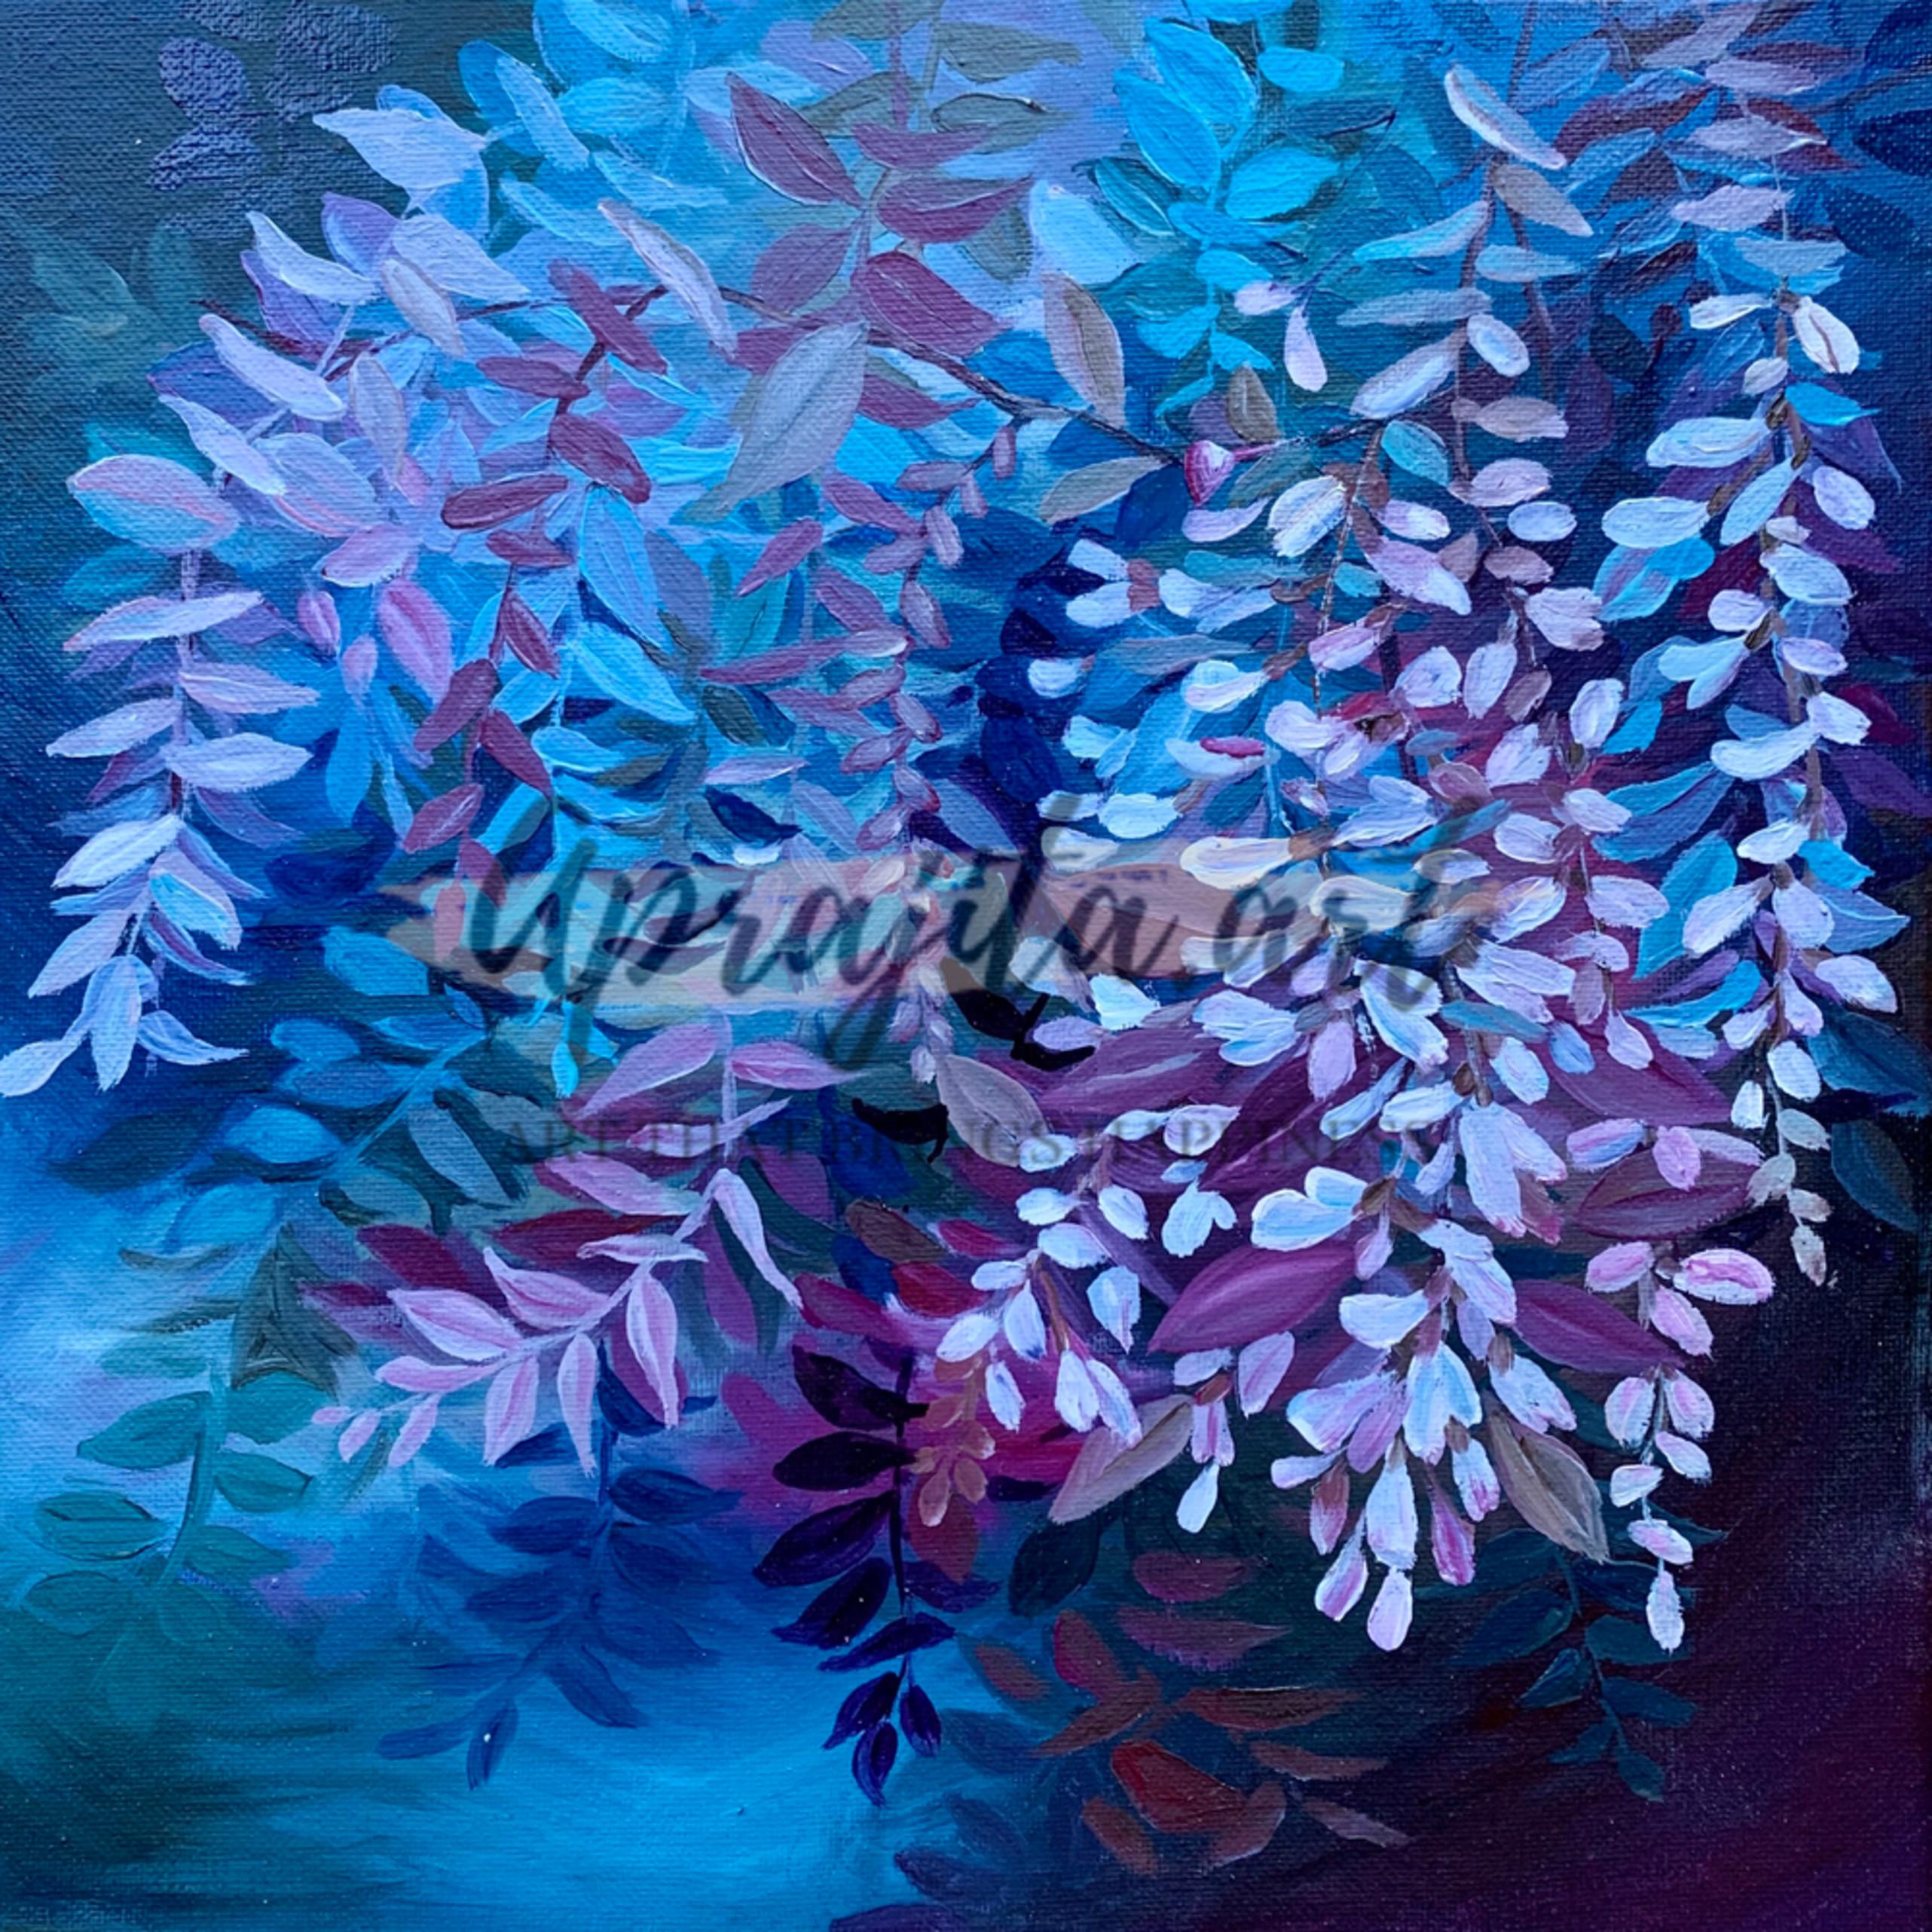 Purplevines jlmycm